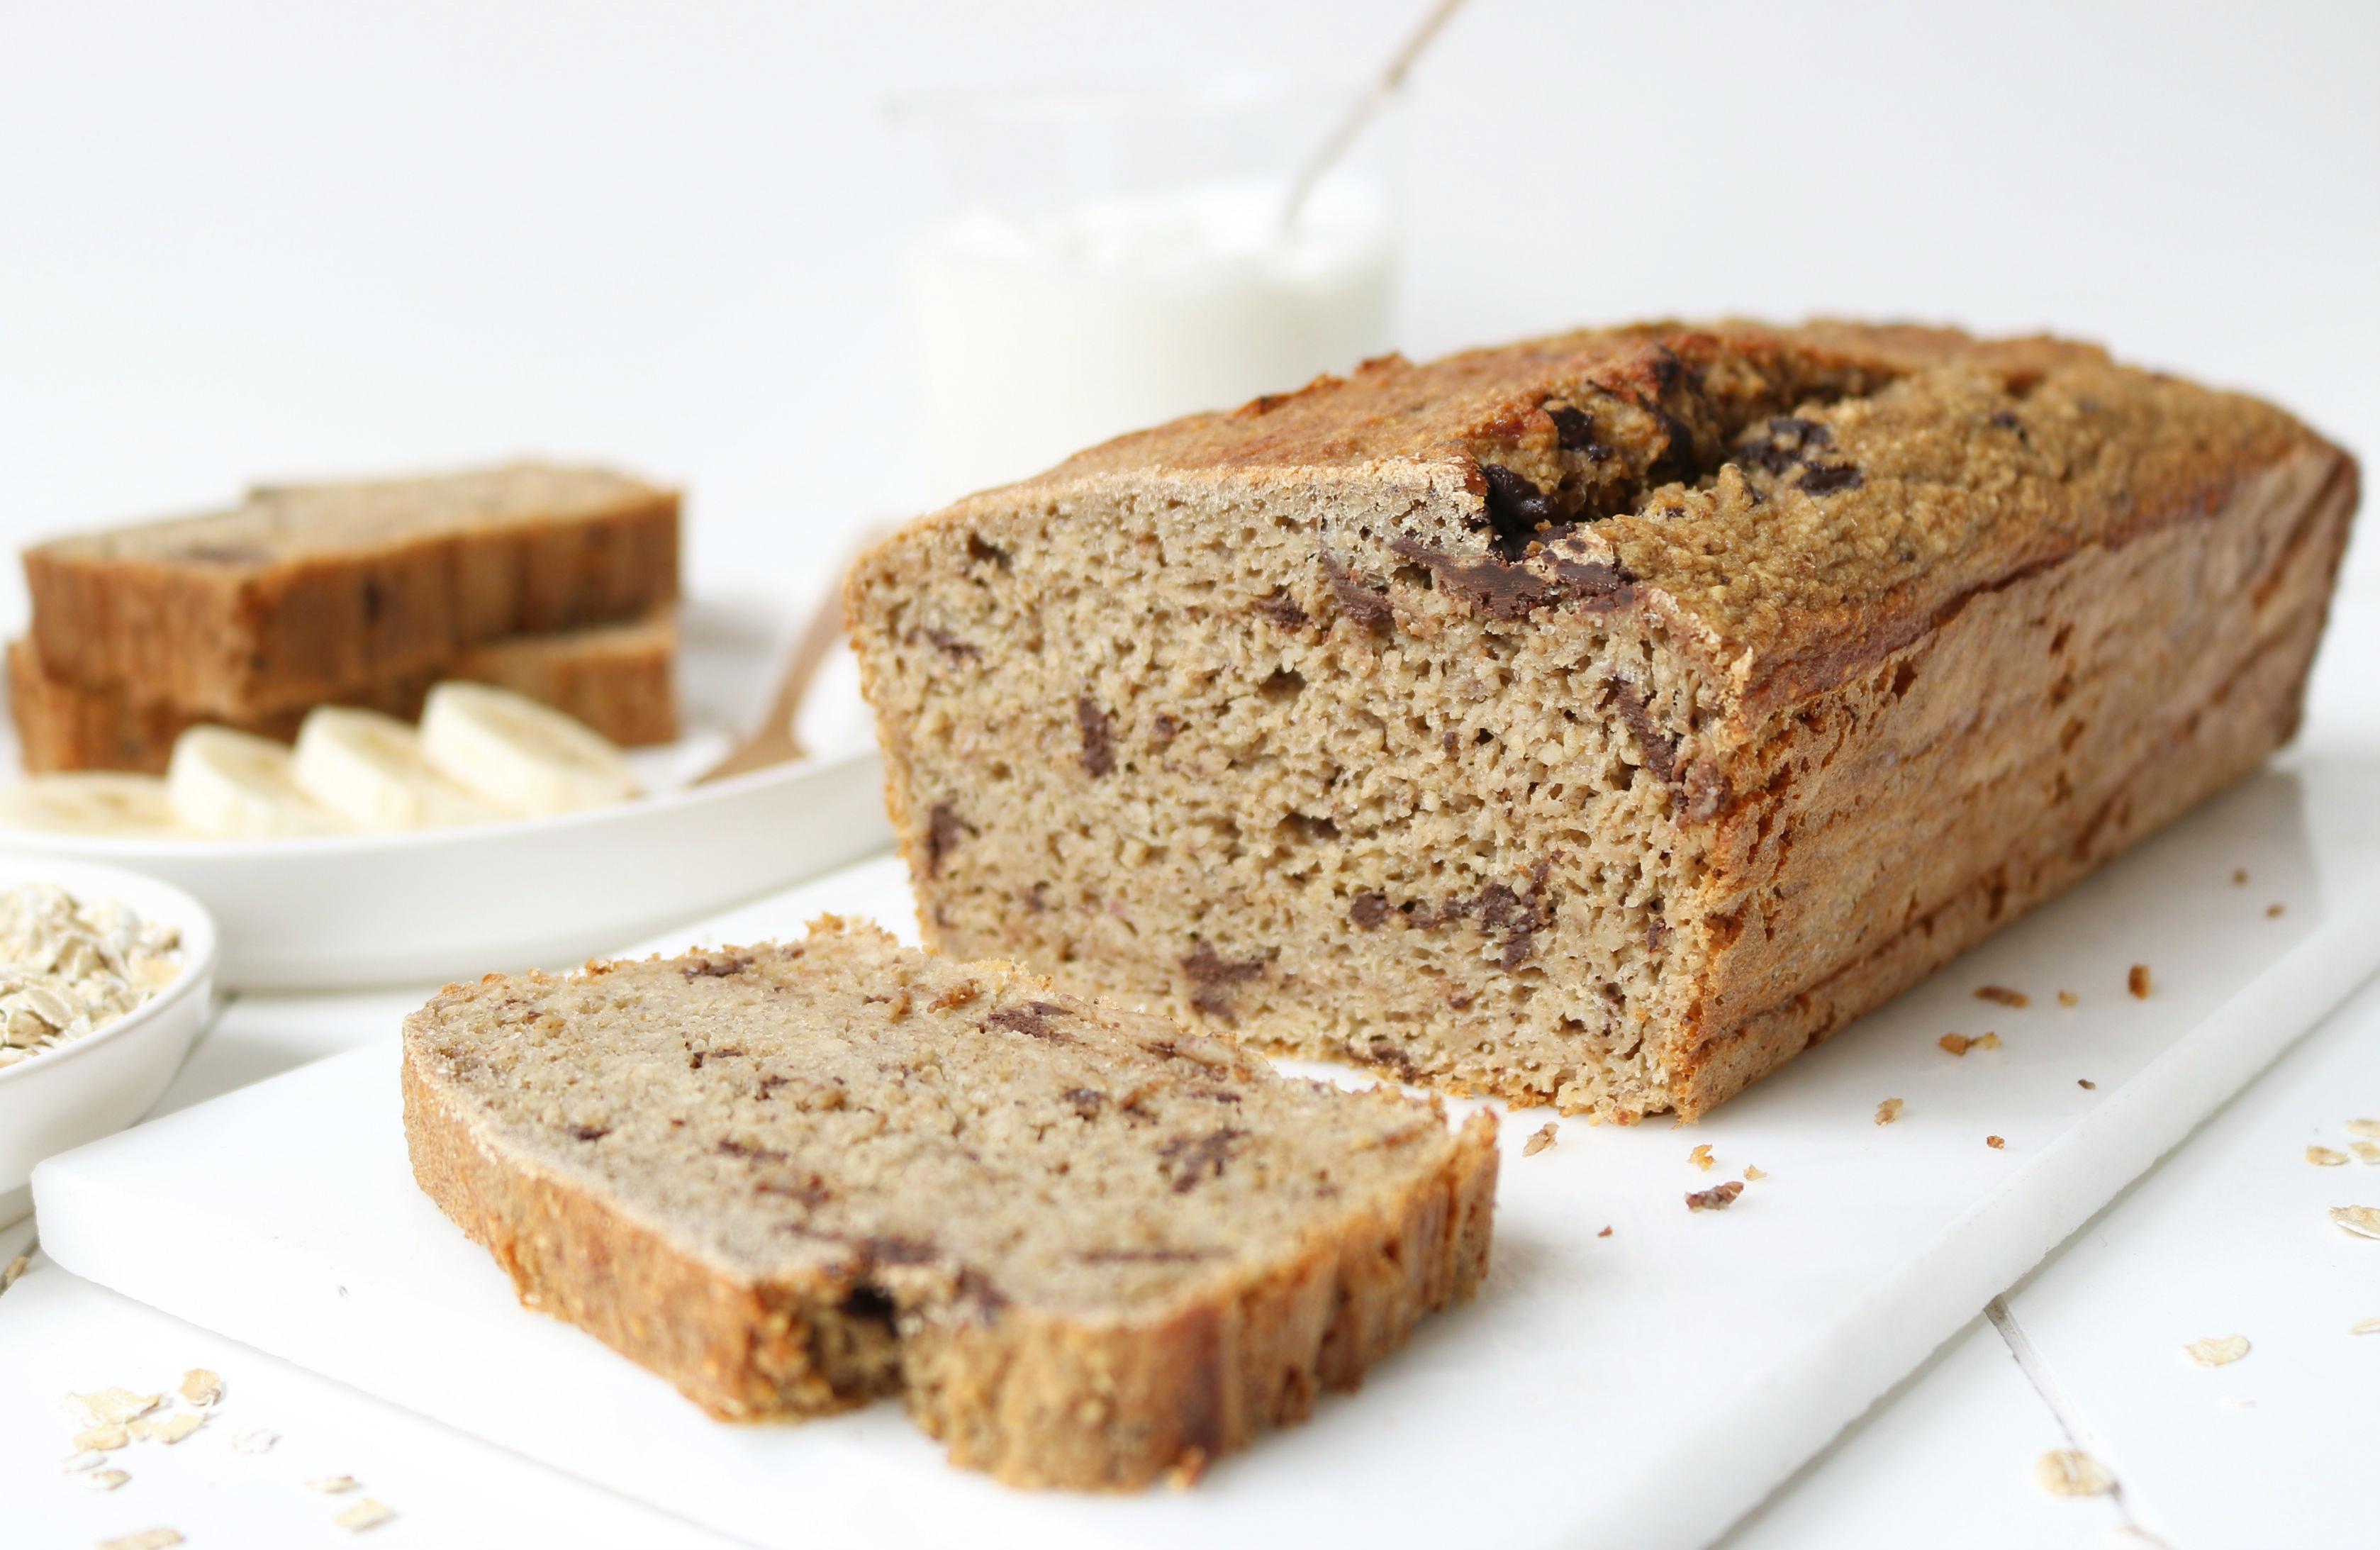 CHOCOLATE-CHIP BANANENBROOD